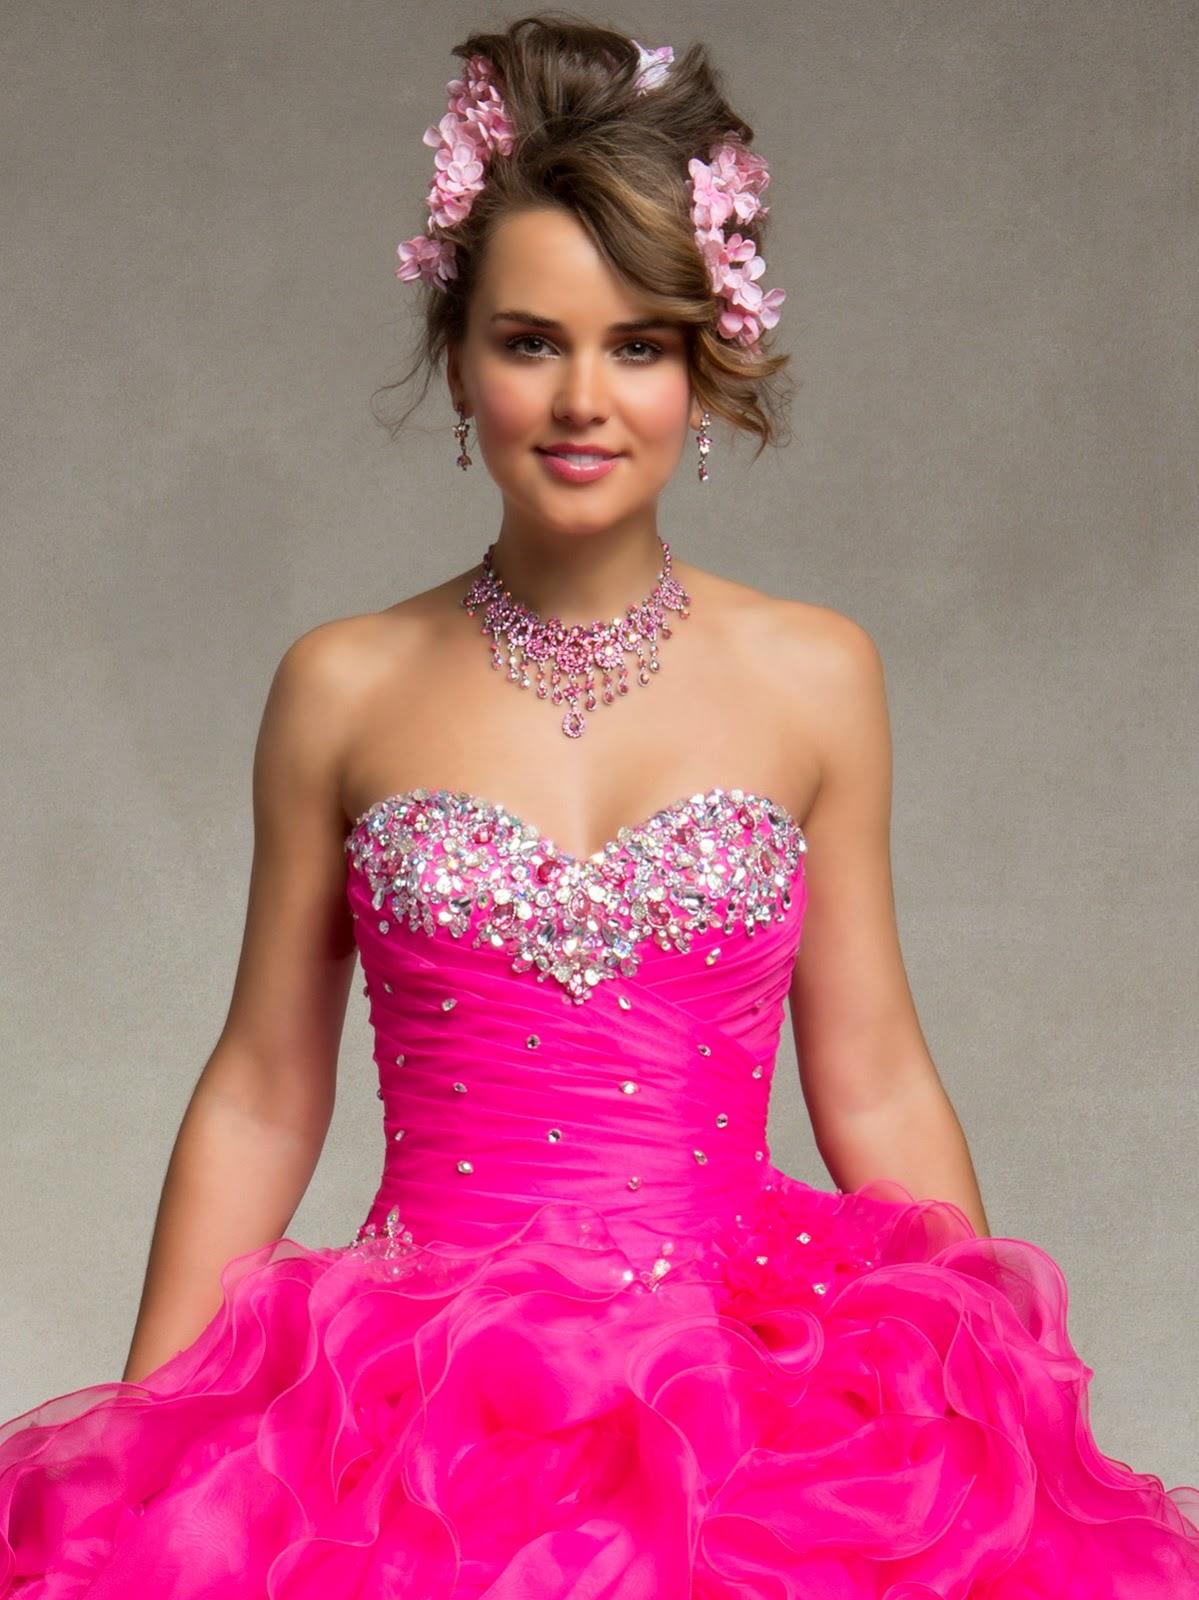 Vestidos para quinceaneras cristianas – Vestidos de moda en España